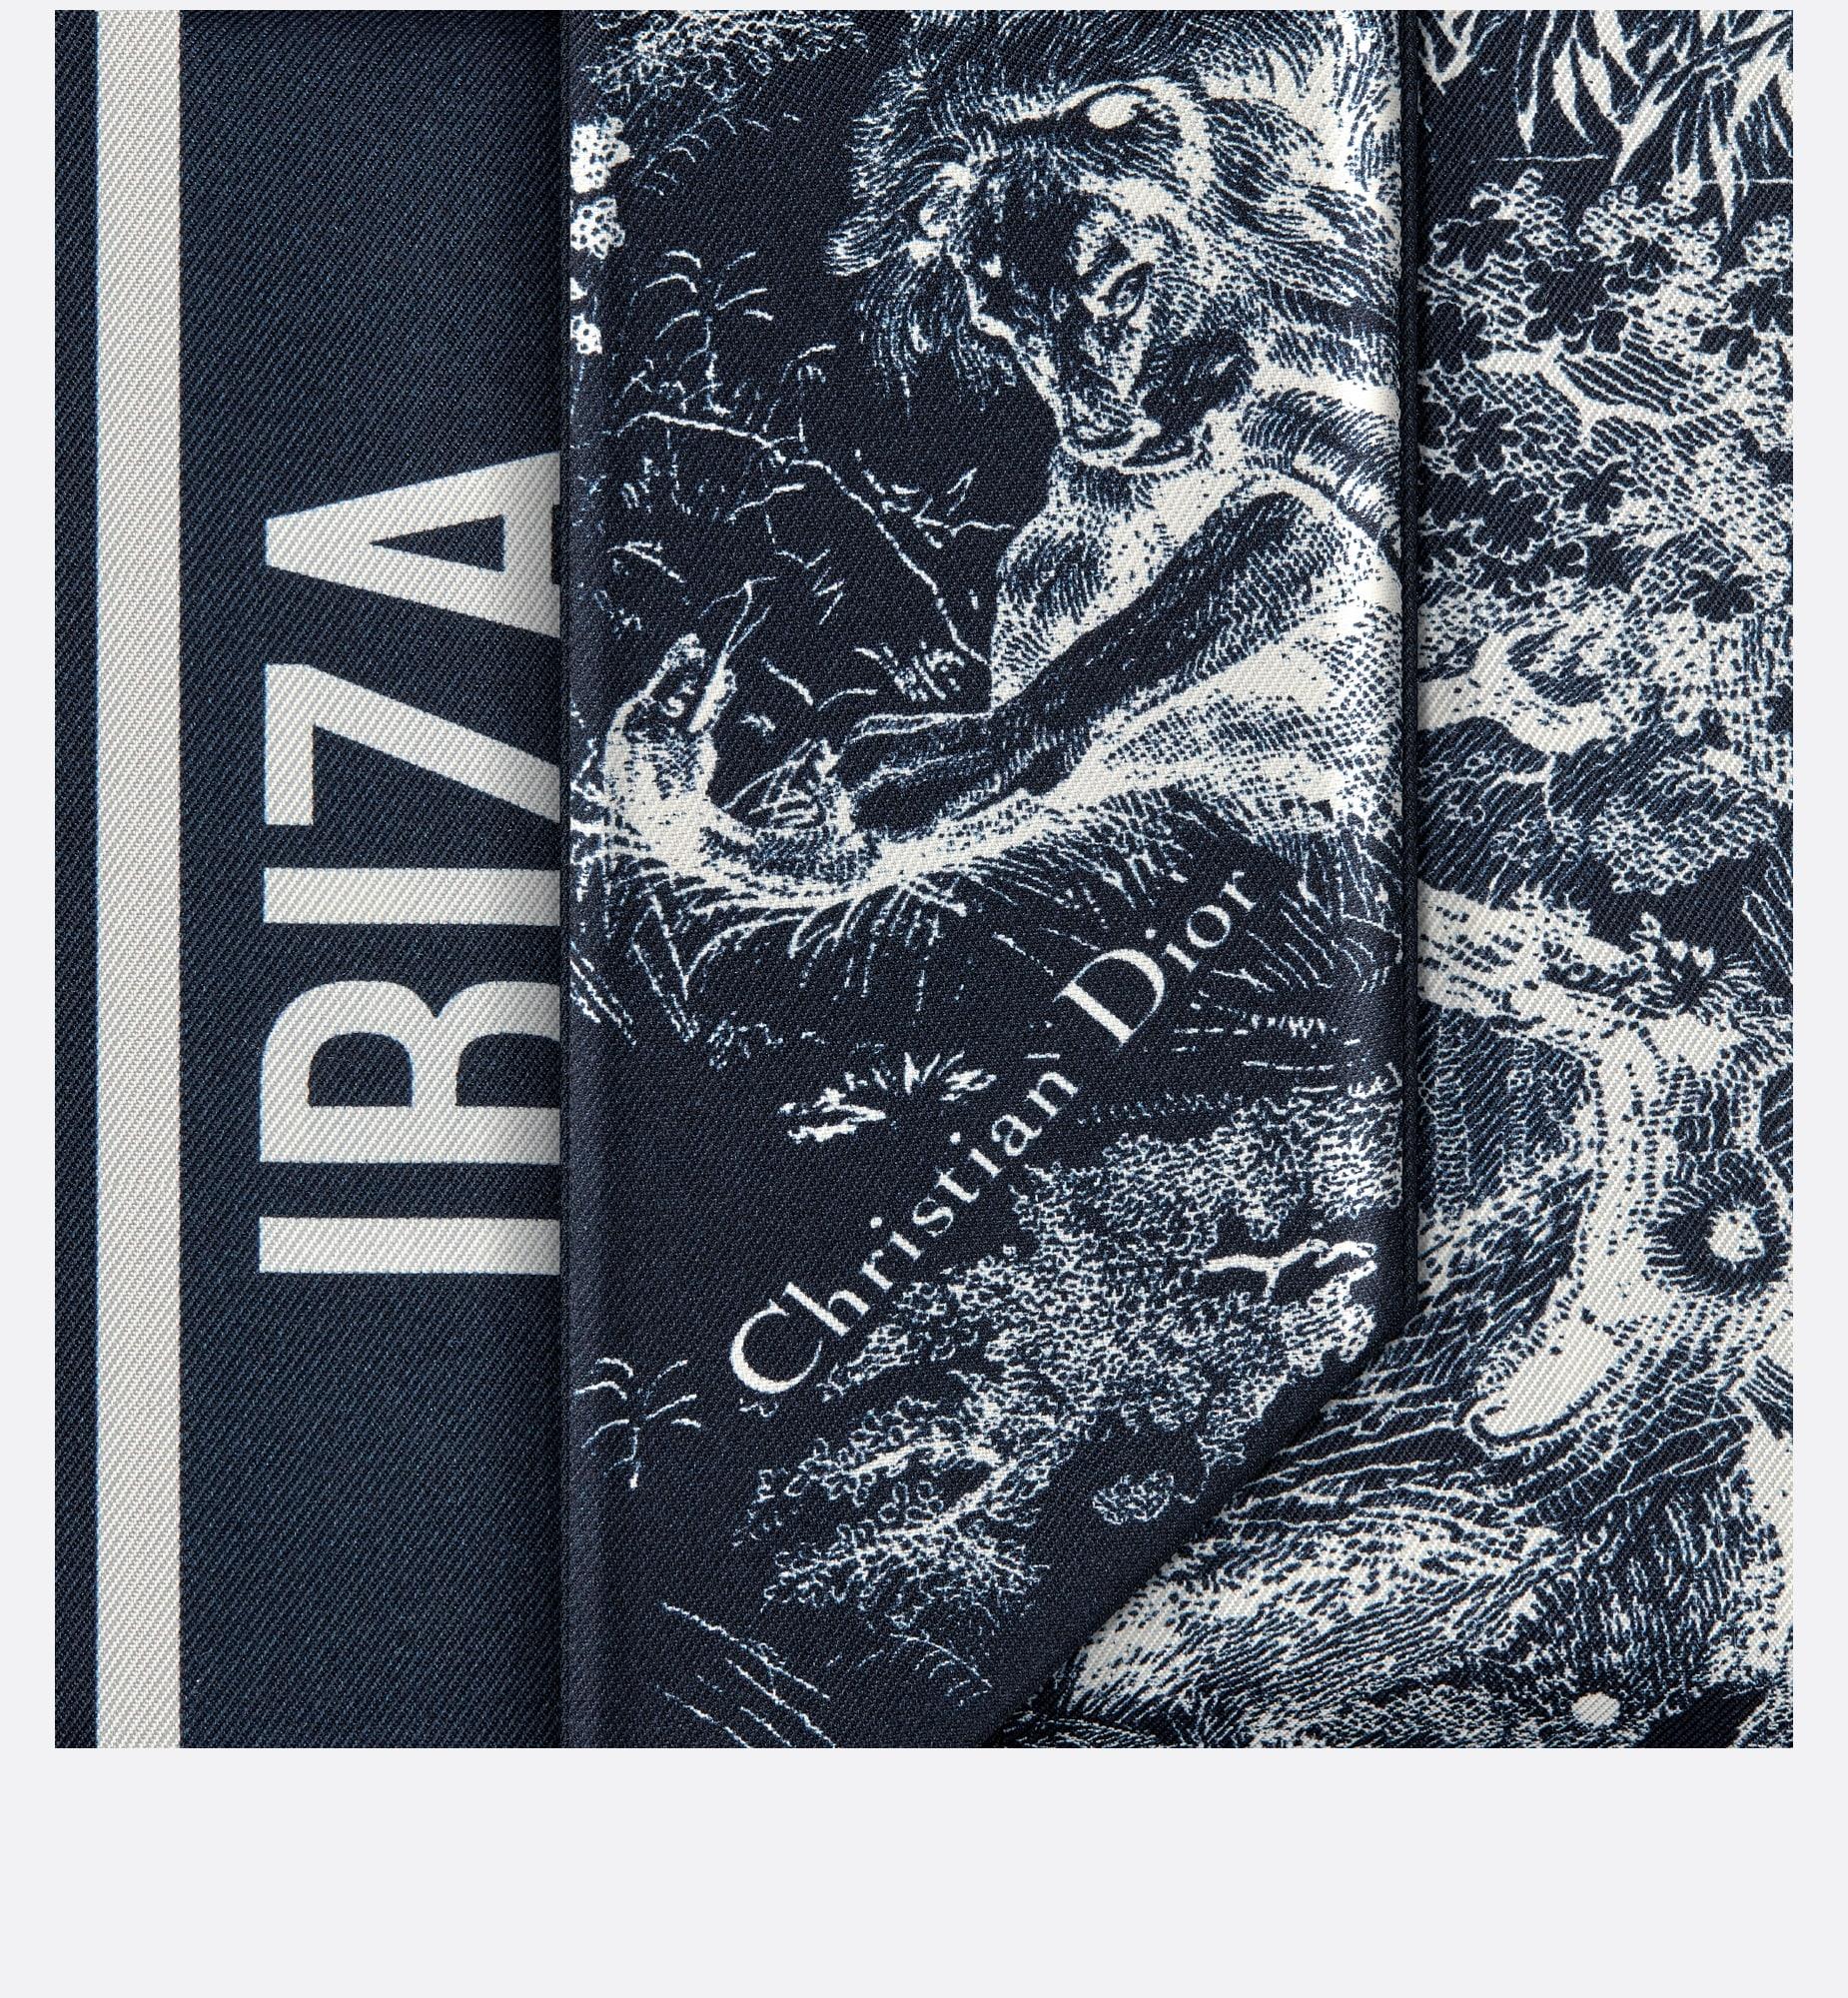 Toile de Jouy Reverse Ibiza Mitzah Tuch  aria_detailedView aria_openGallery